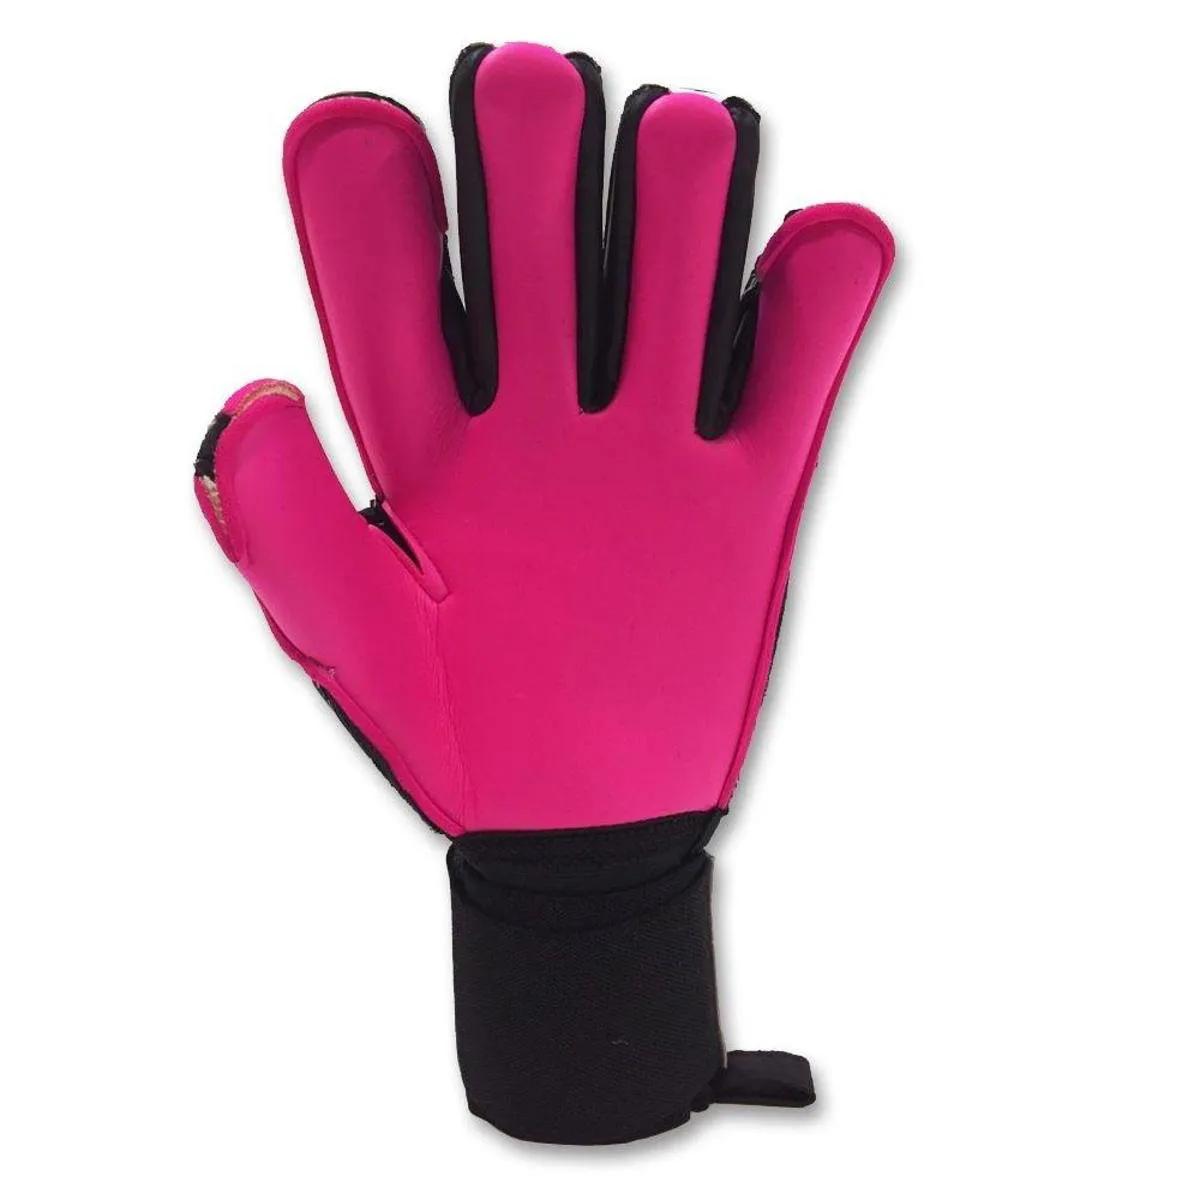 Luva N1 Beta Elite Pink